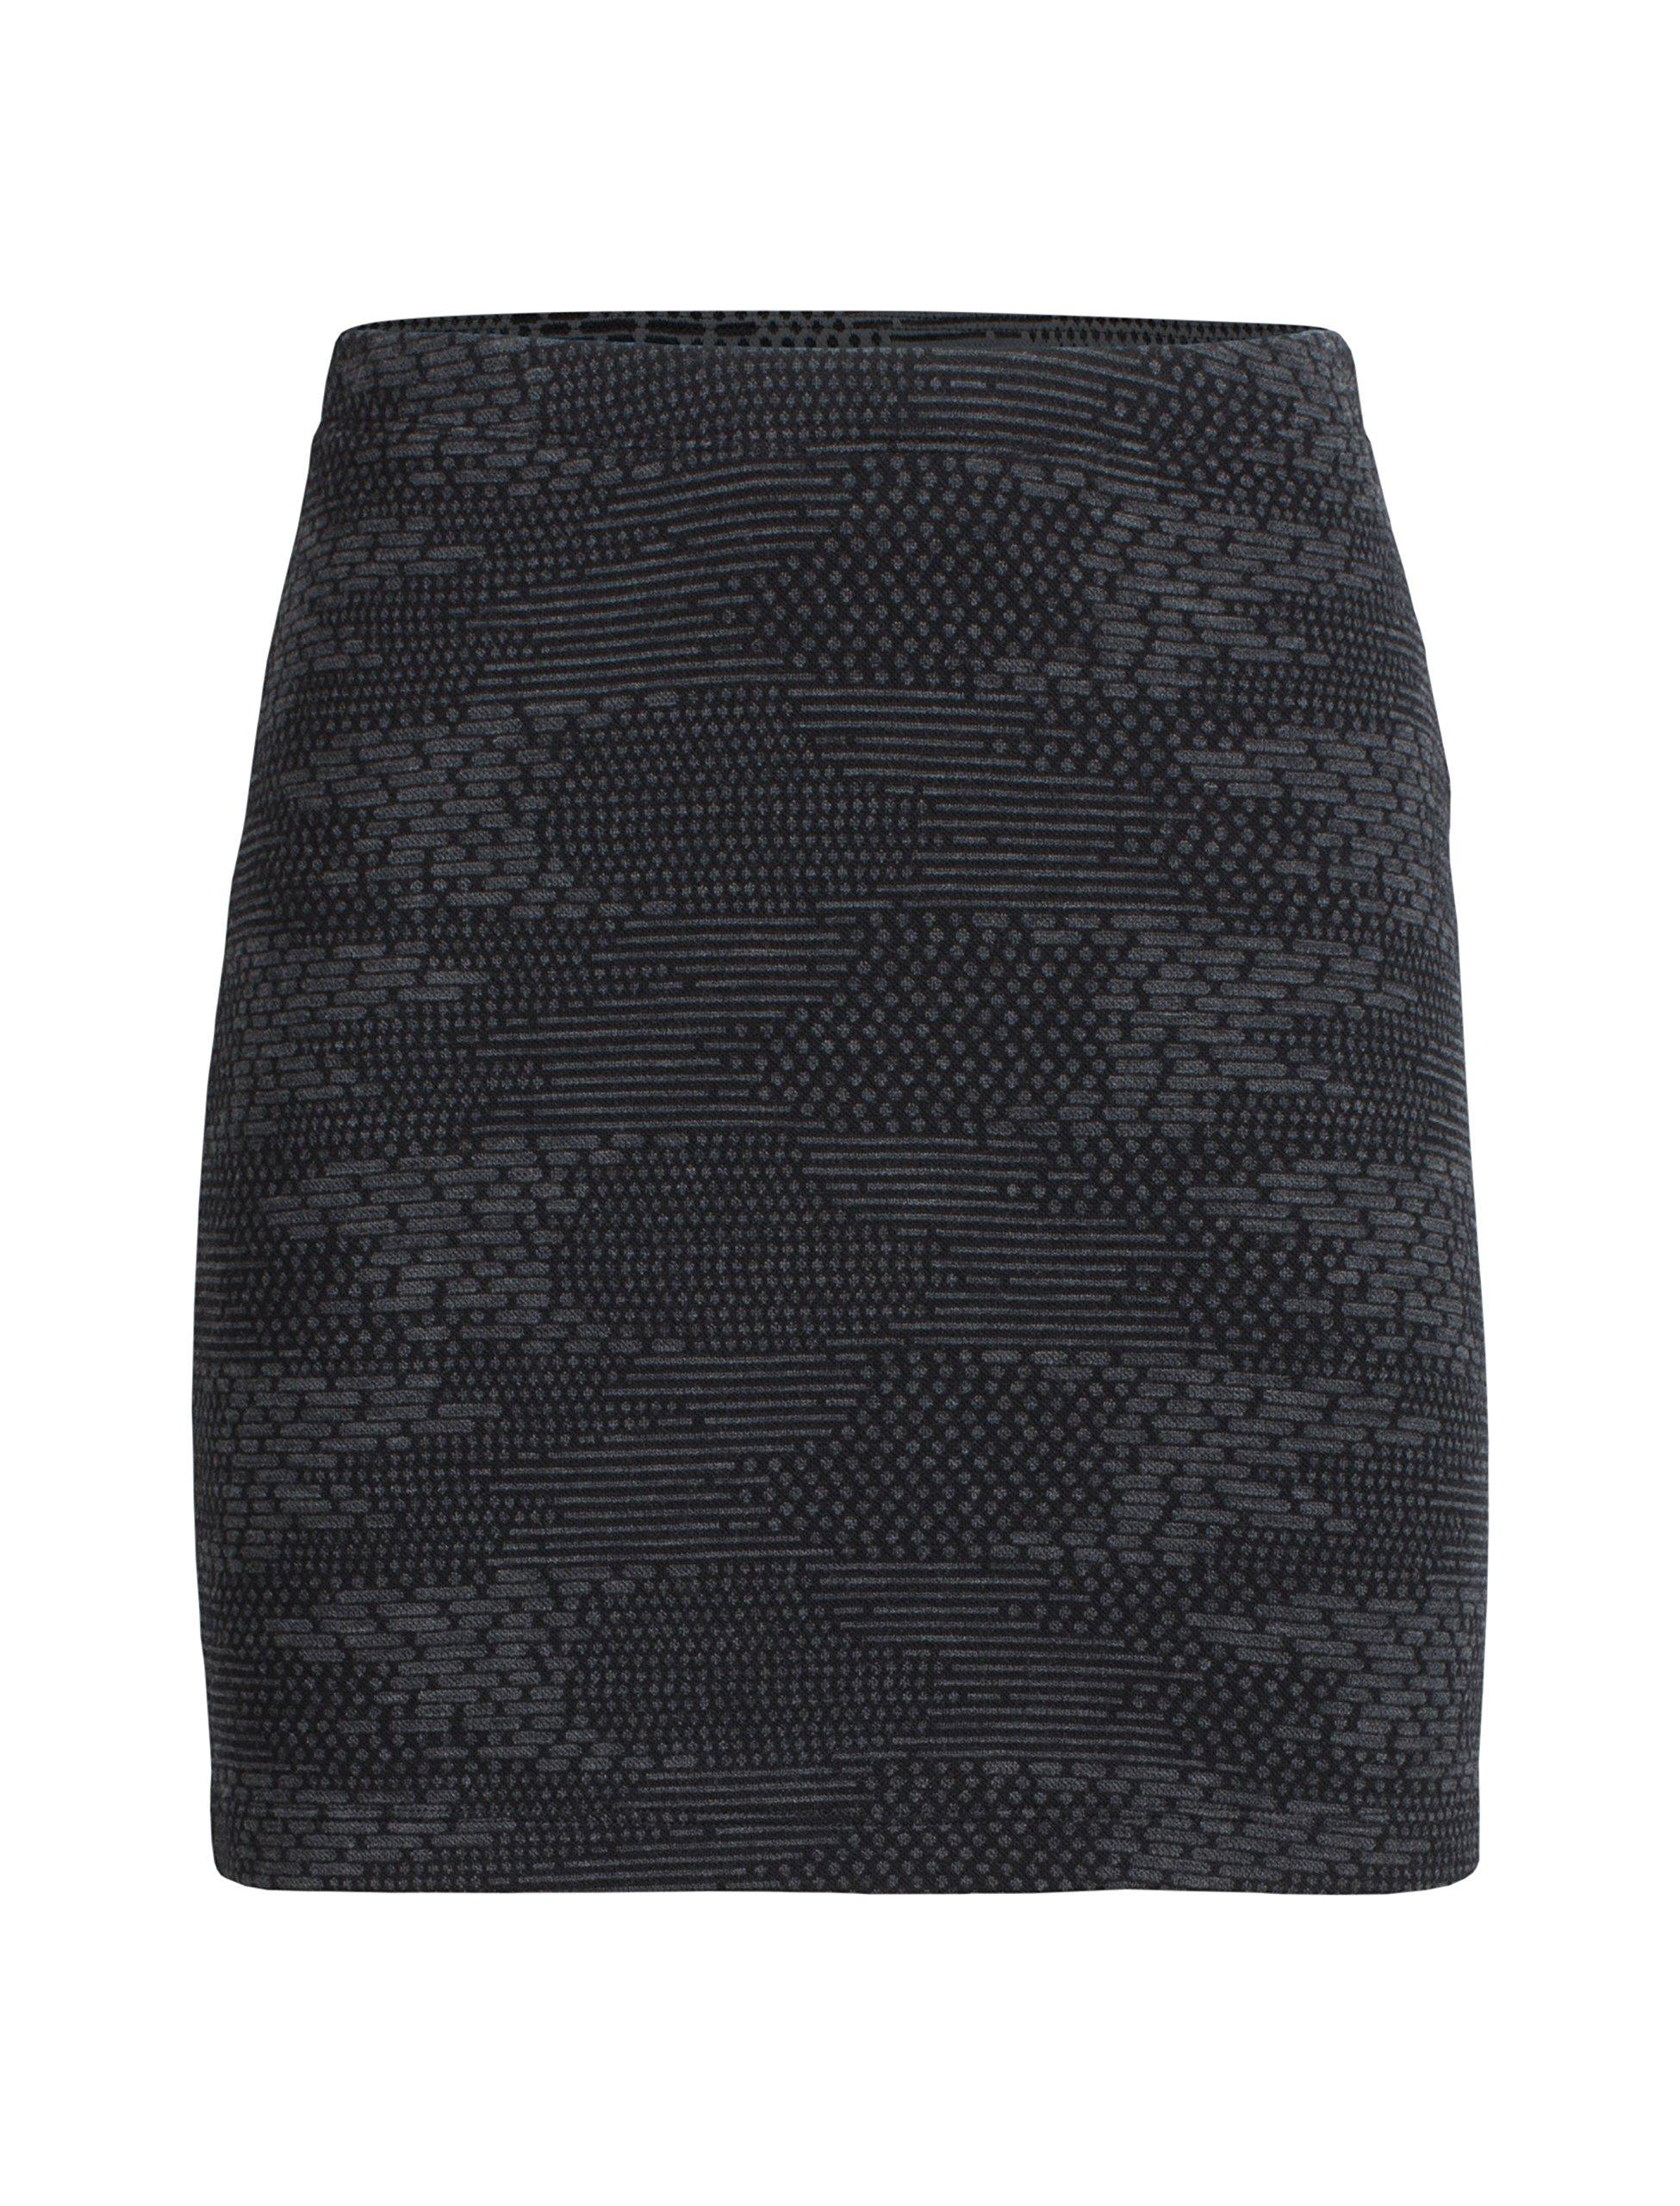 Icebreaker Merino Women's Affinity Skirt Flurry, Black/Jet Heather, Medium